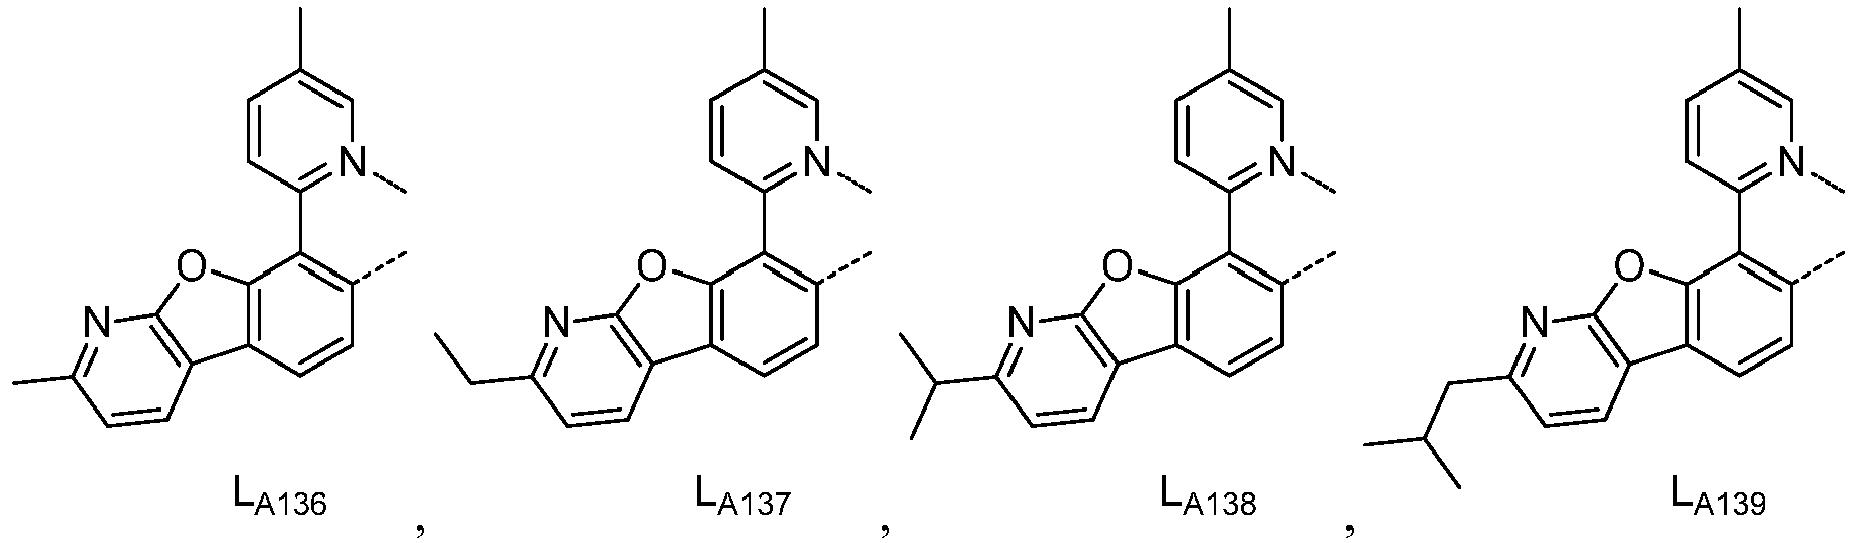 Figure imgb0050